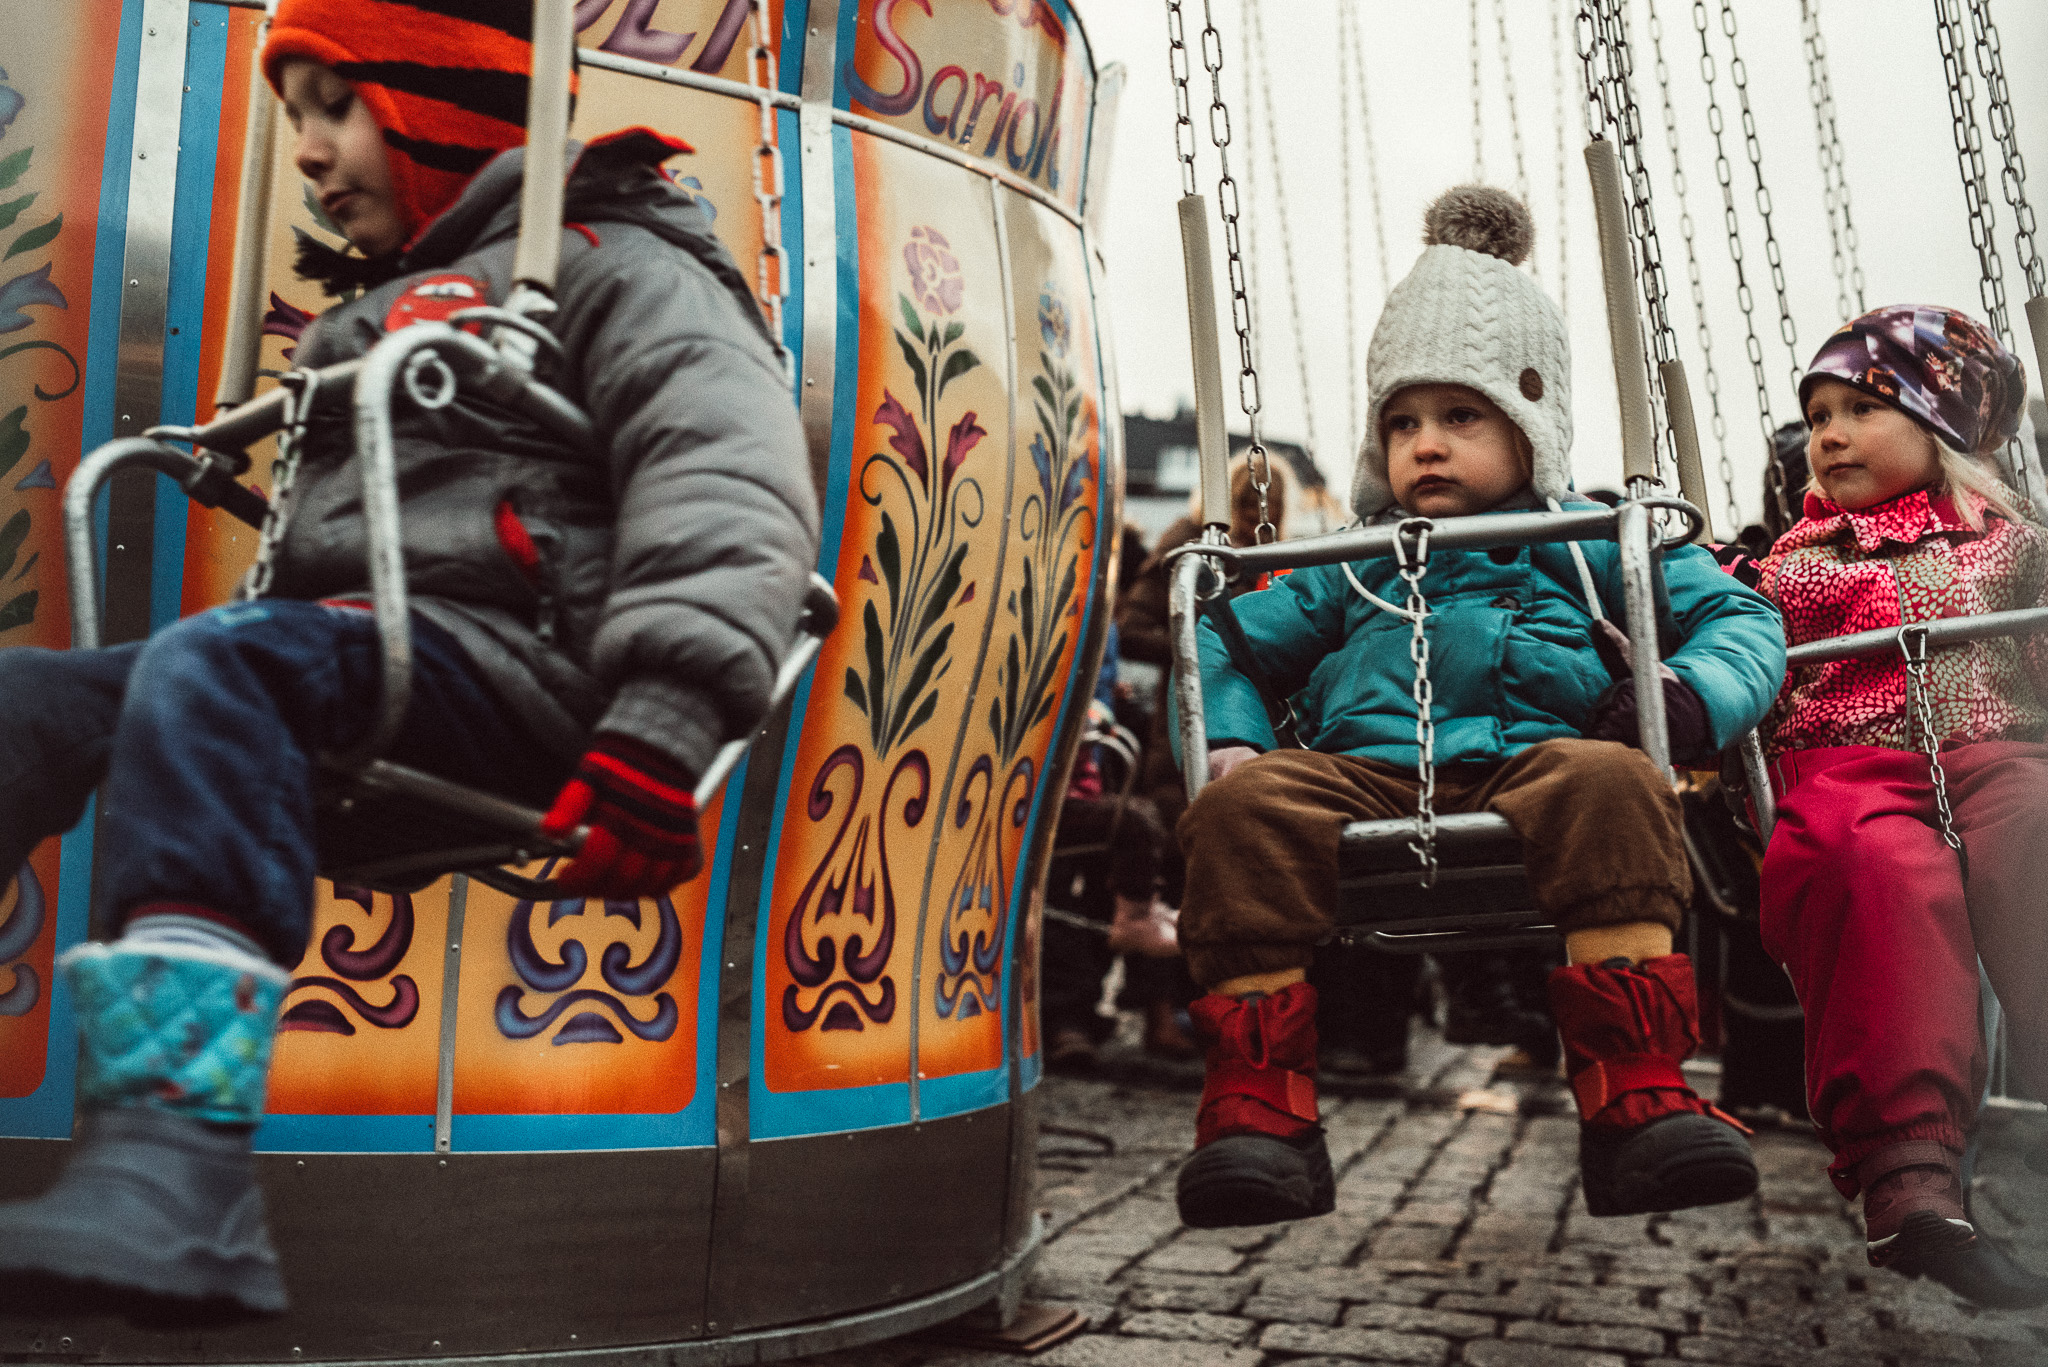 Child sitting in carousel